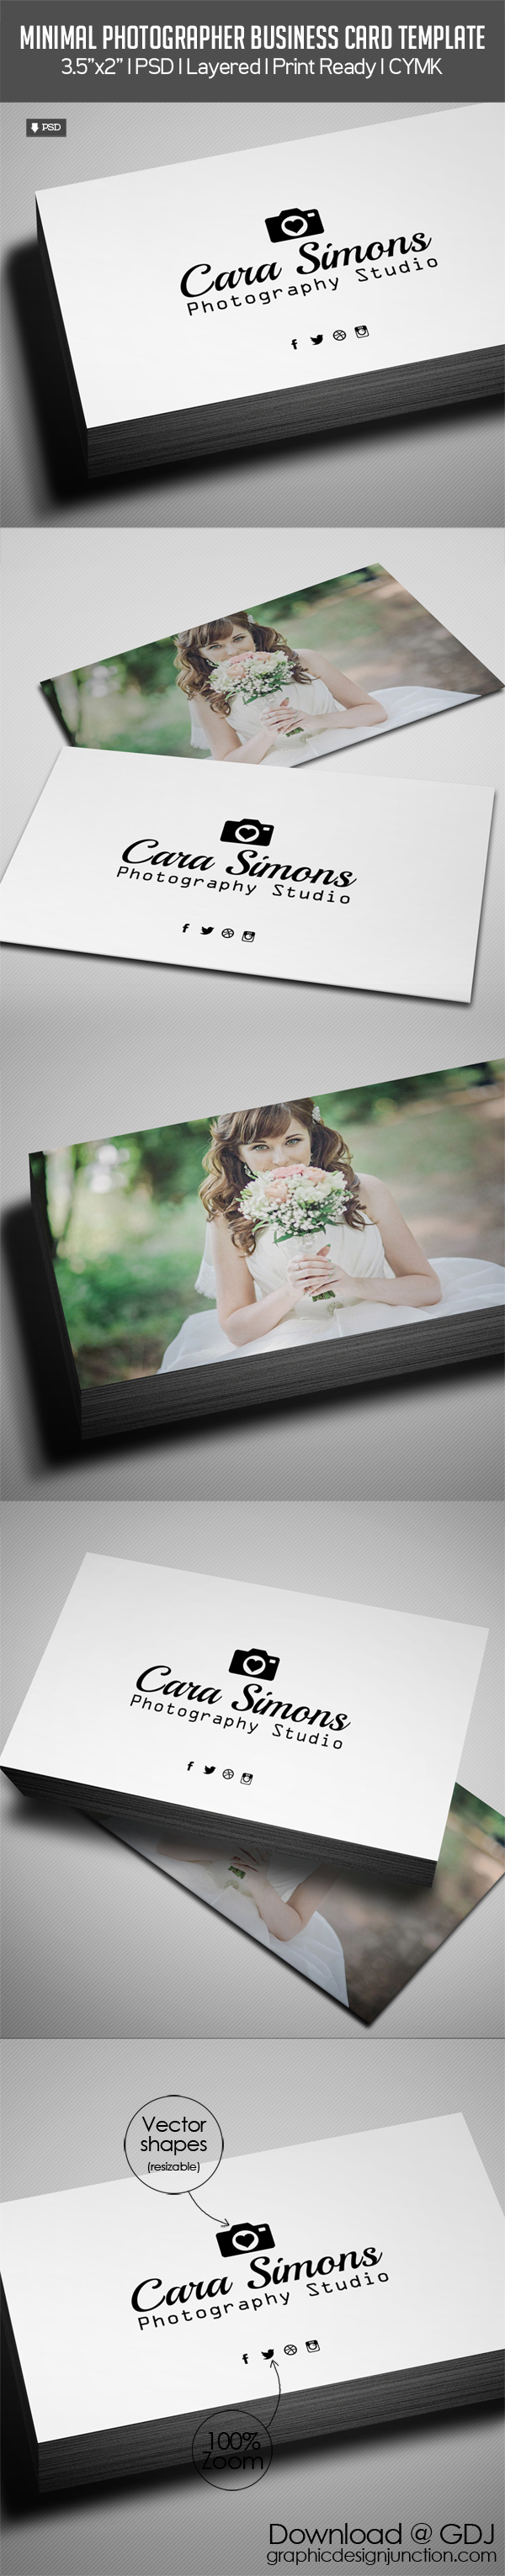 Freebie – Photographer Business Card PSD Template